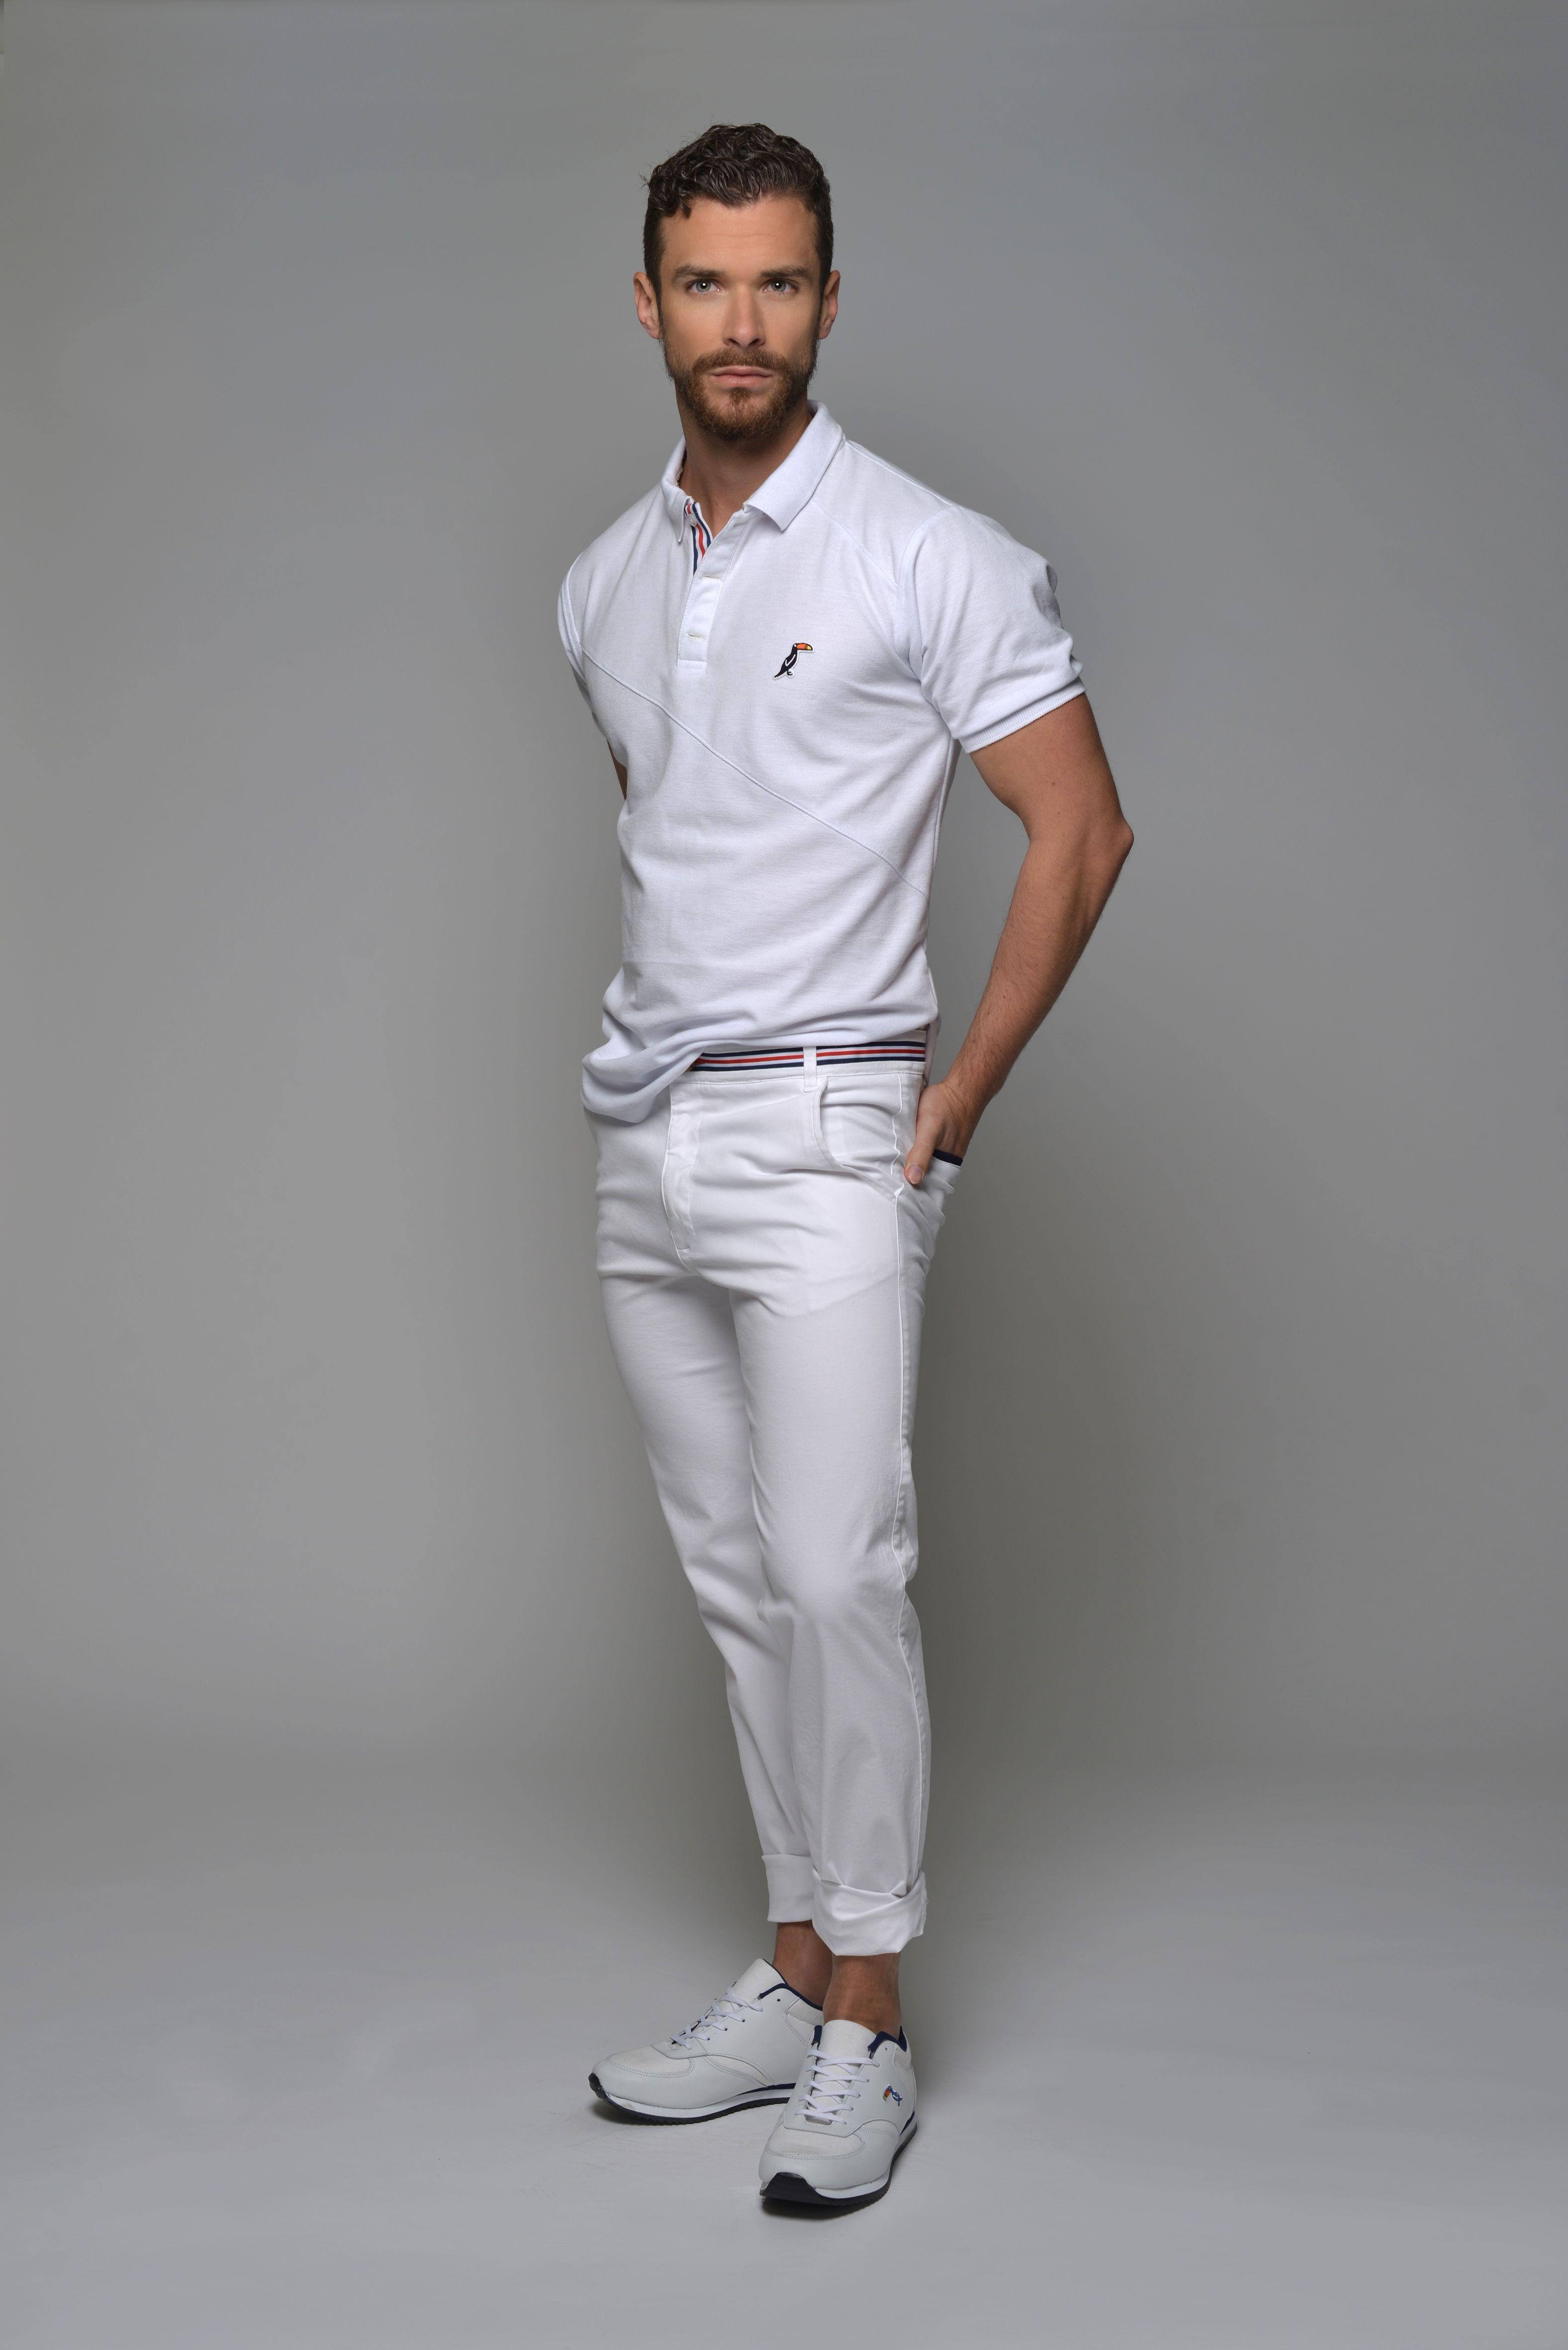 Look Polo Cambridge Blanco Pantalones Hamptons Blanco Tennis